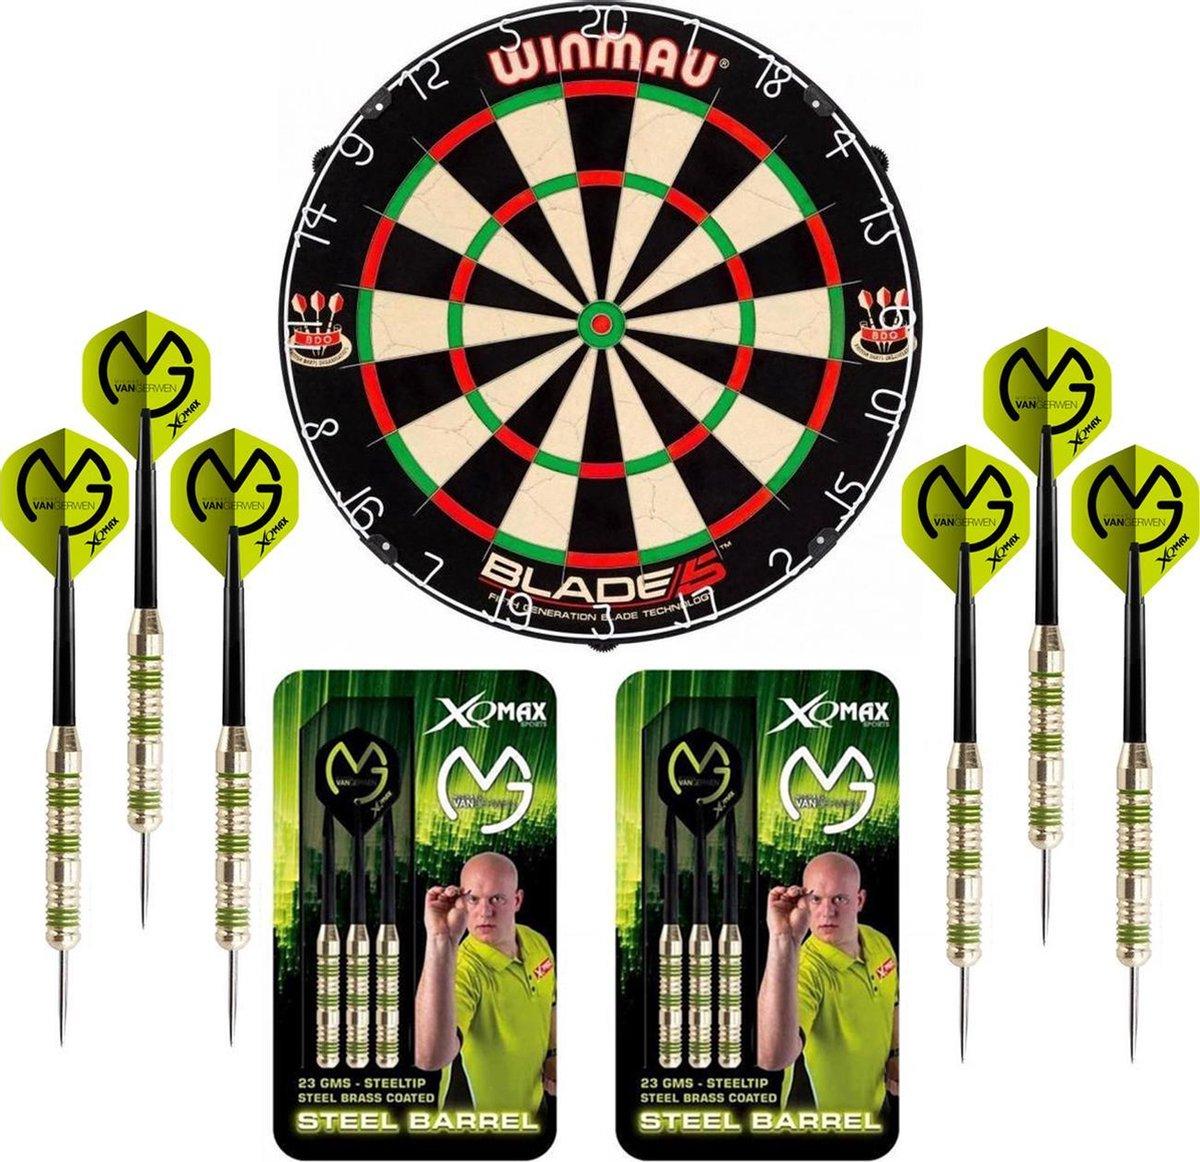 Dragon Darts Michael van Gerwen Octane set - dartbord - 2 sets - dartpijlen - dart shafts - dart flights - Winmau Blade 5 dartbord